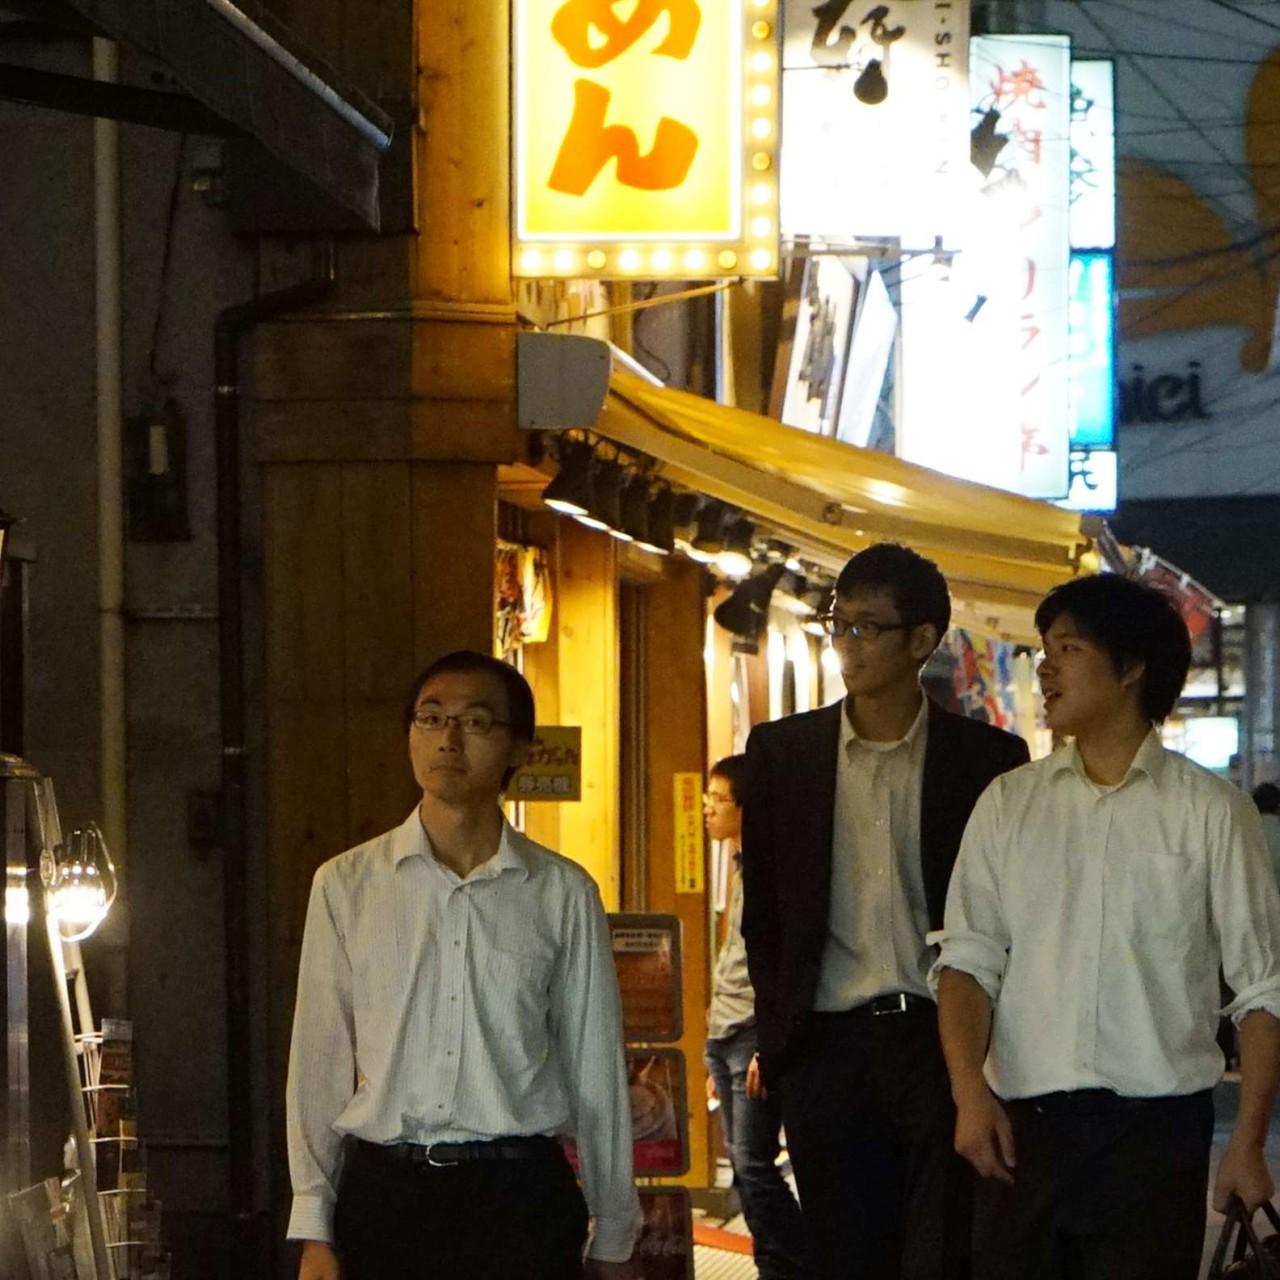 Japan's millennial men don't drink, don't drive, don't